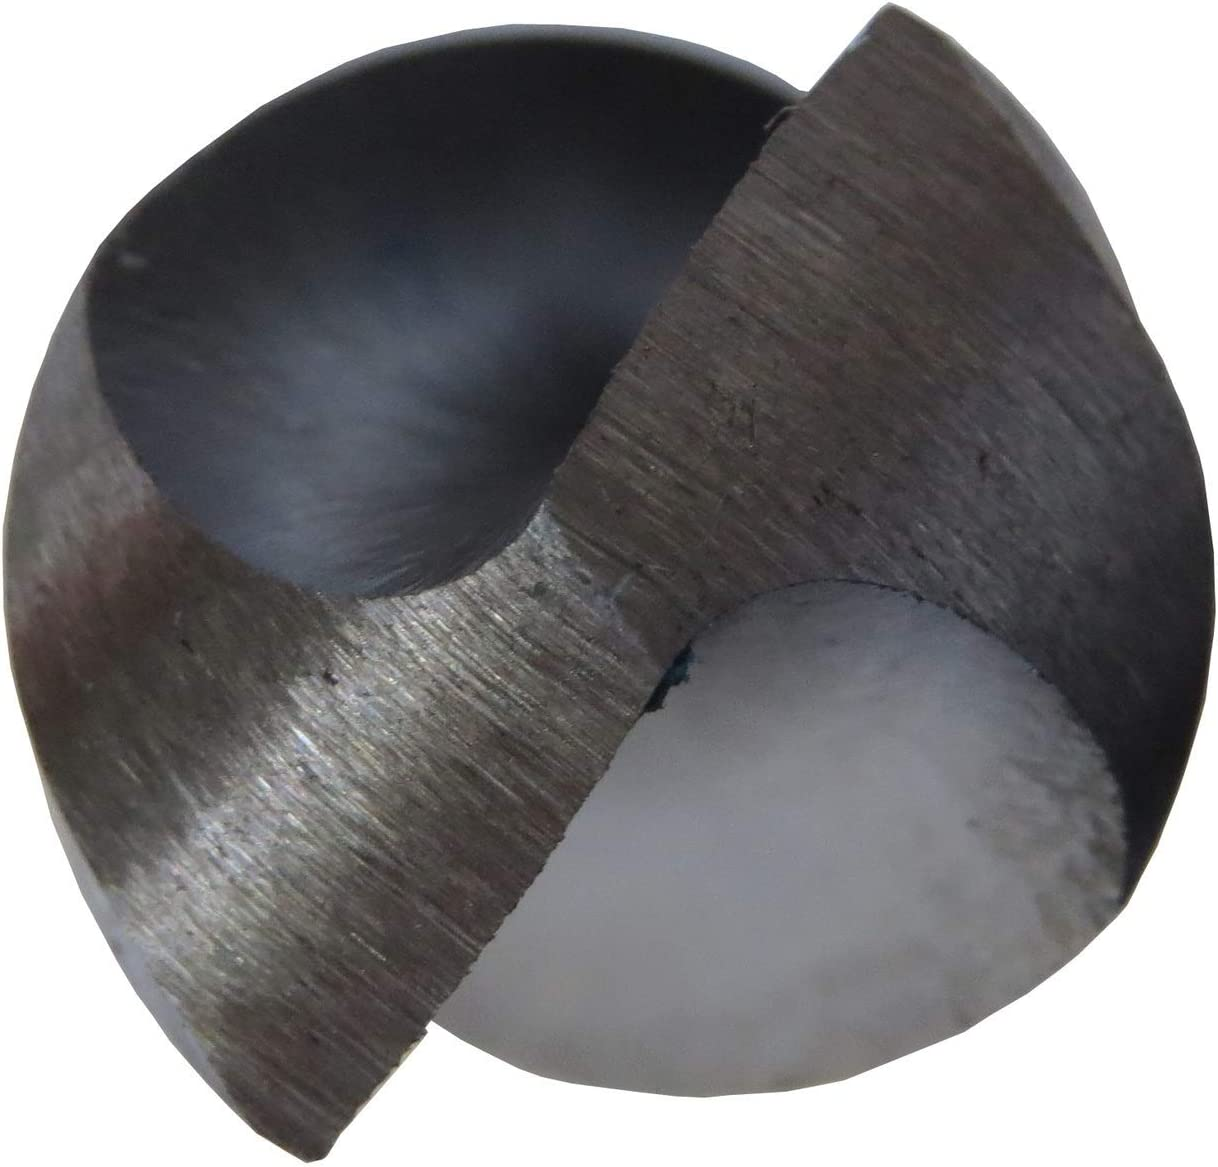 DWDRSD34X1-23//32 Qualtech 1-23//32 HSS Reduced Shank Drill Bit 3//4 Shank